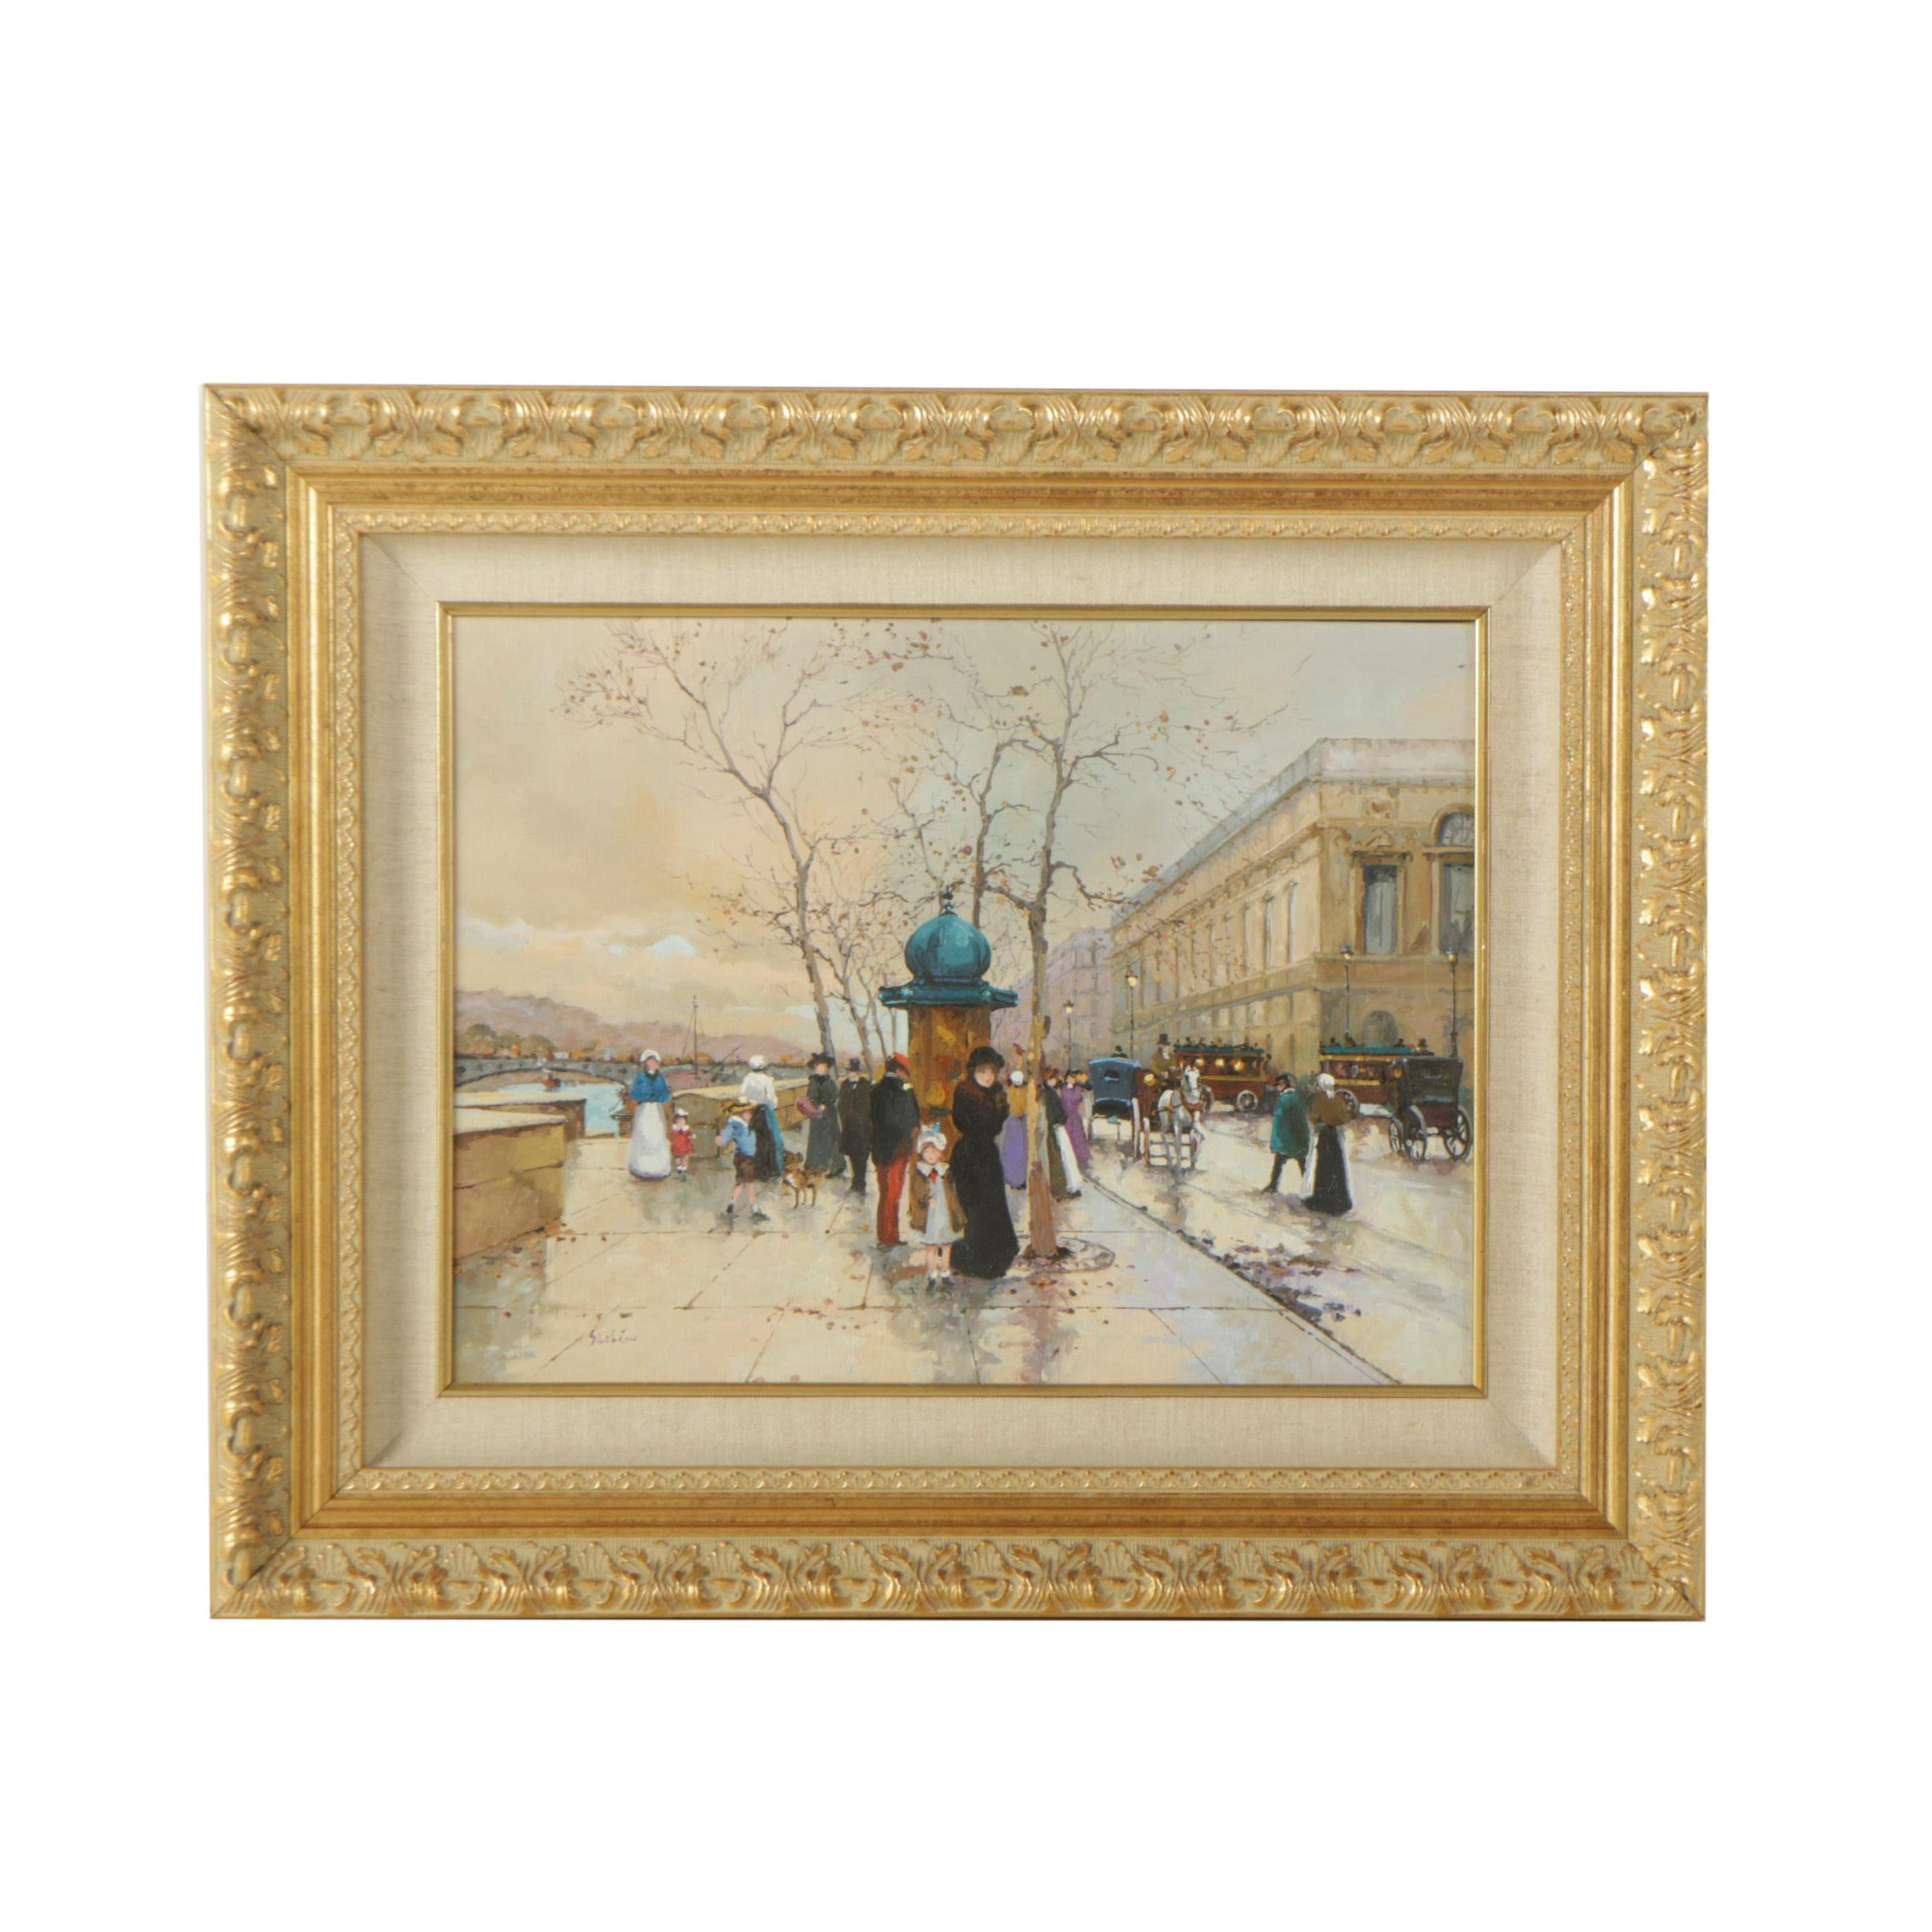 Sue Lebron Original Oil Painting on Canvas